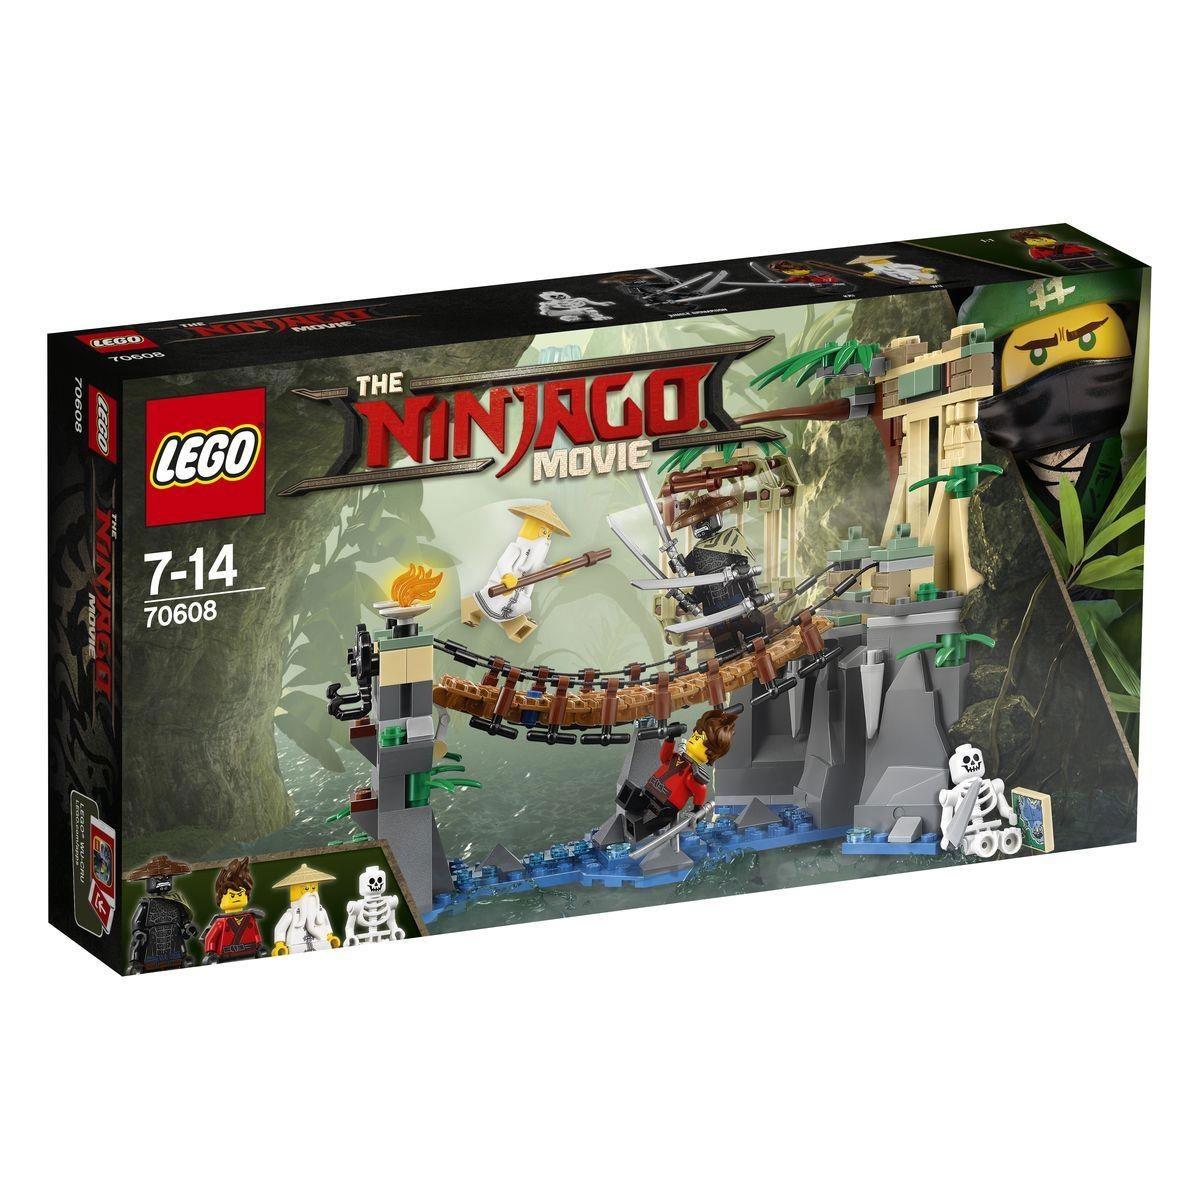 Lego Ninjago Movie 70608 Meister Wus Wasser-Fall